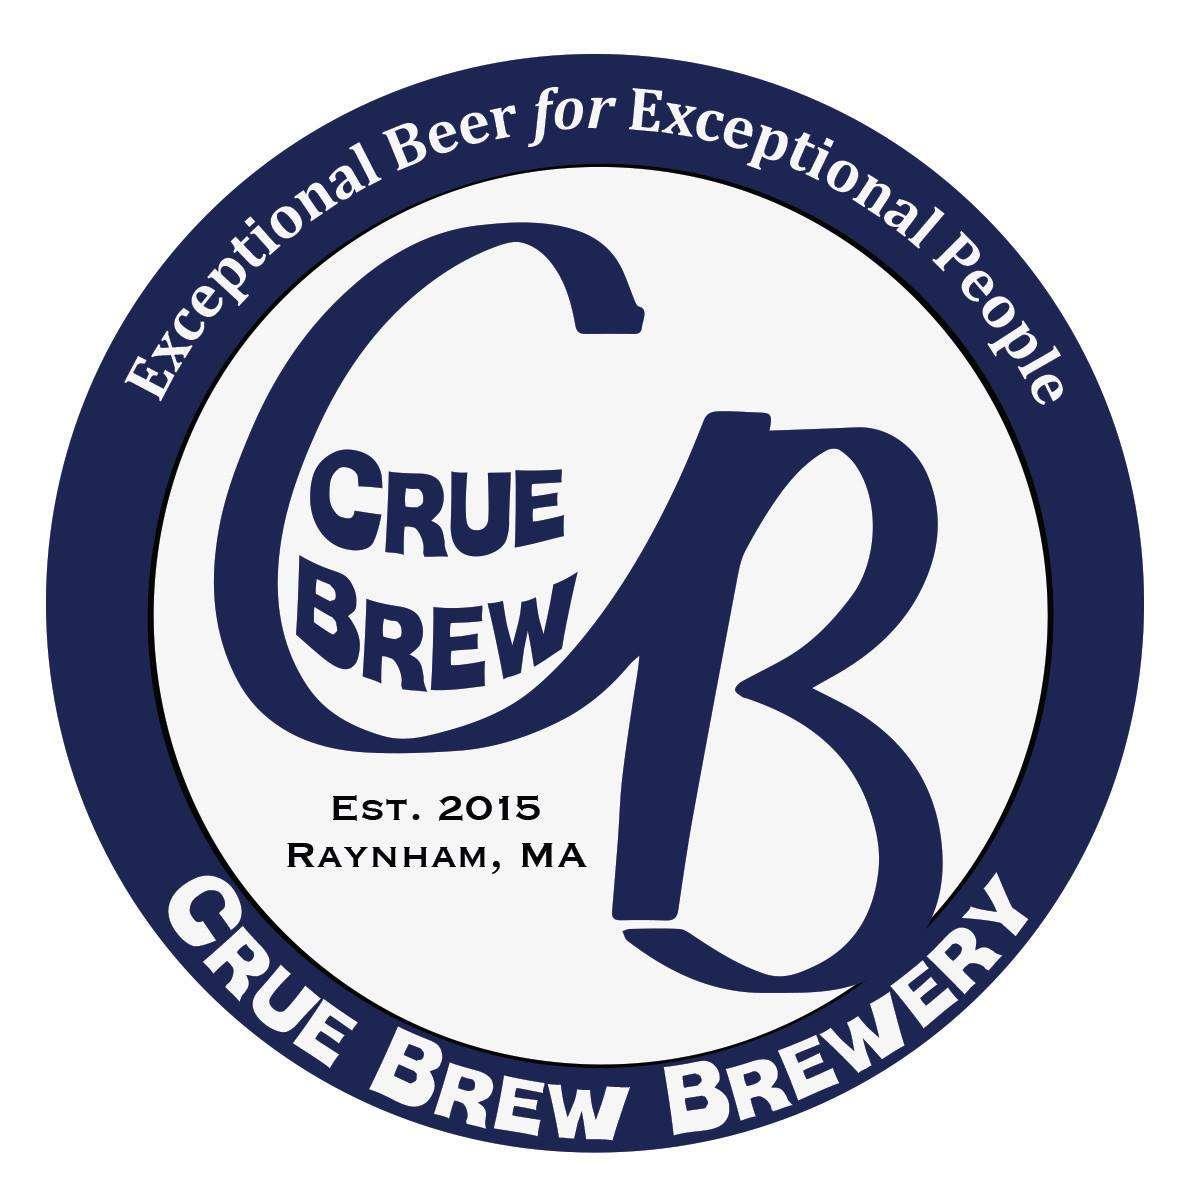 logo for Crue Brew